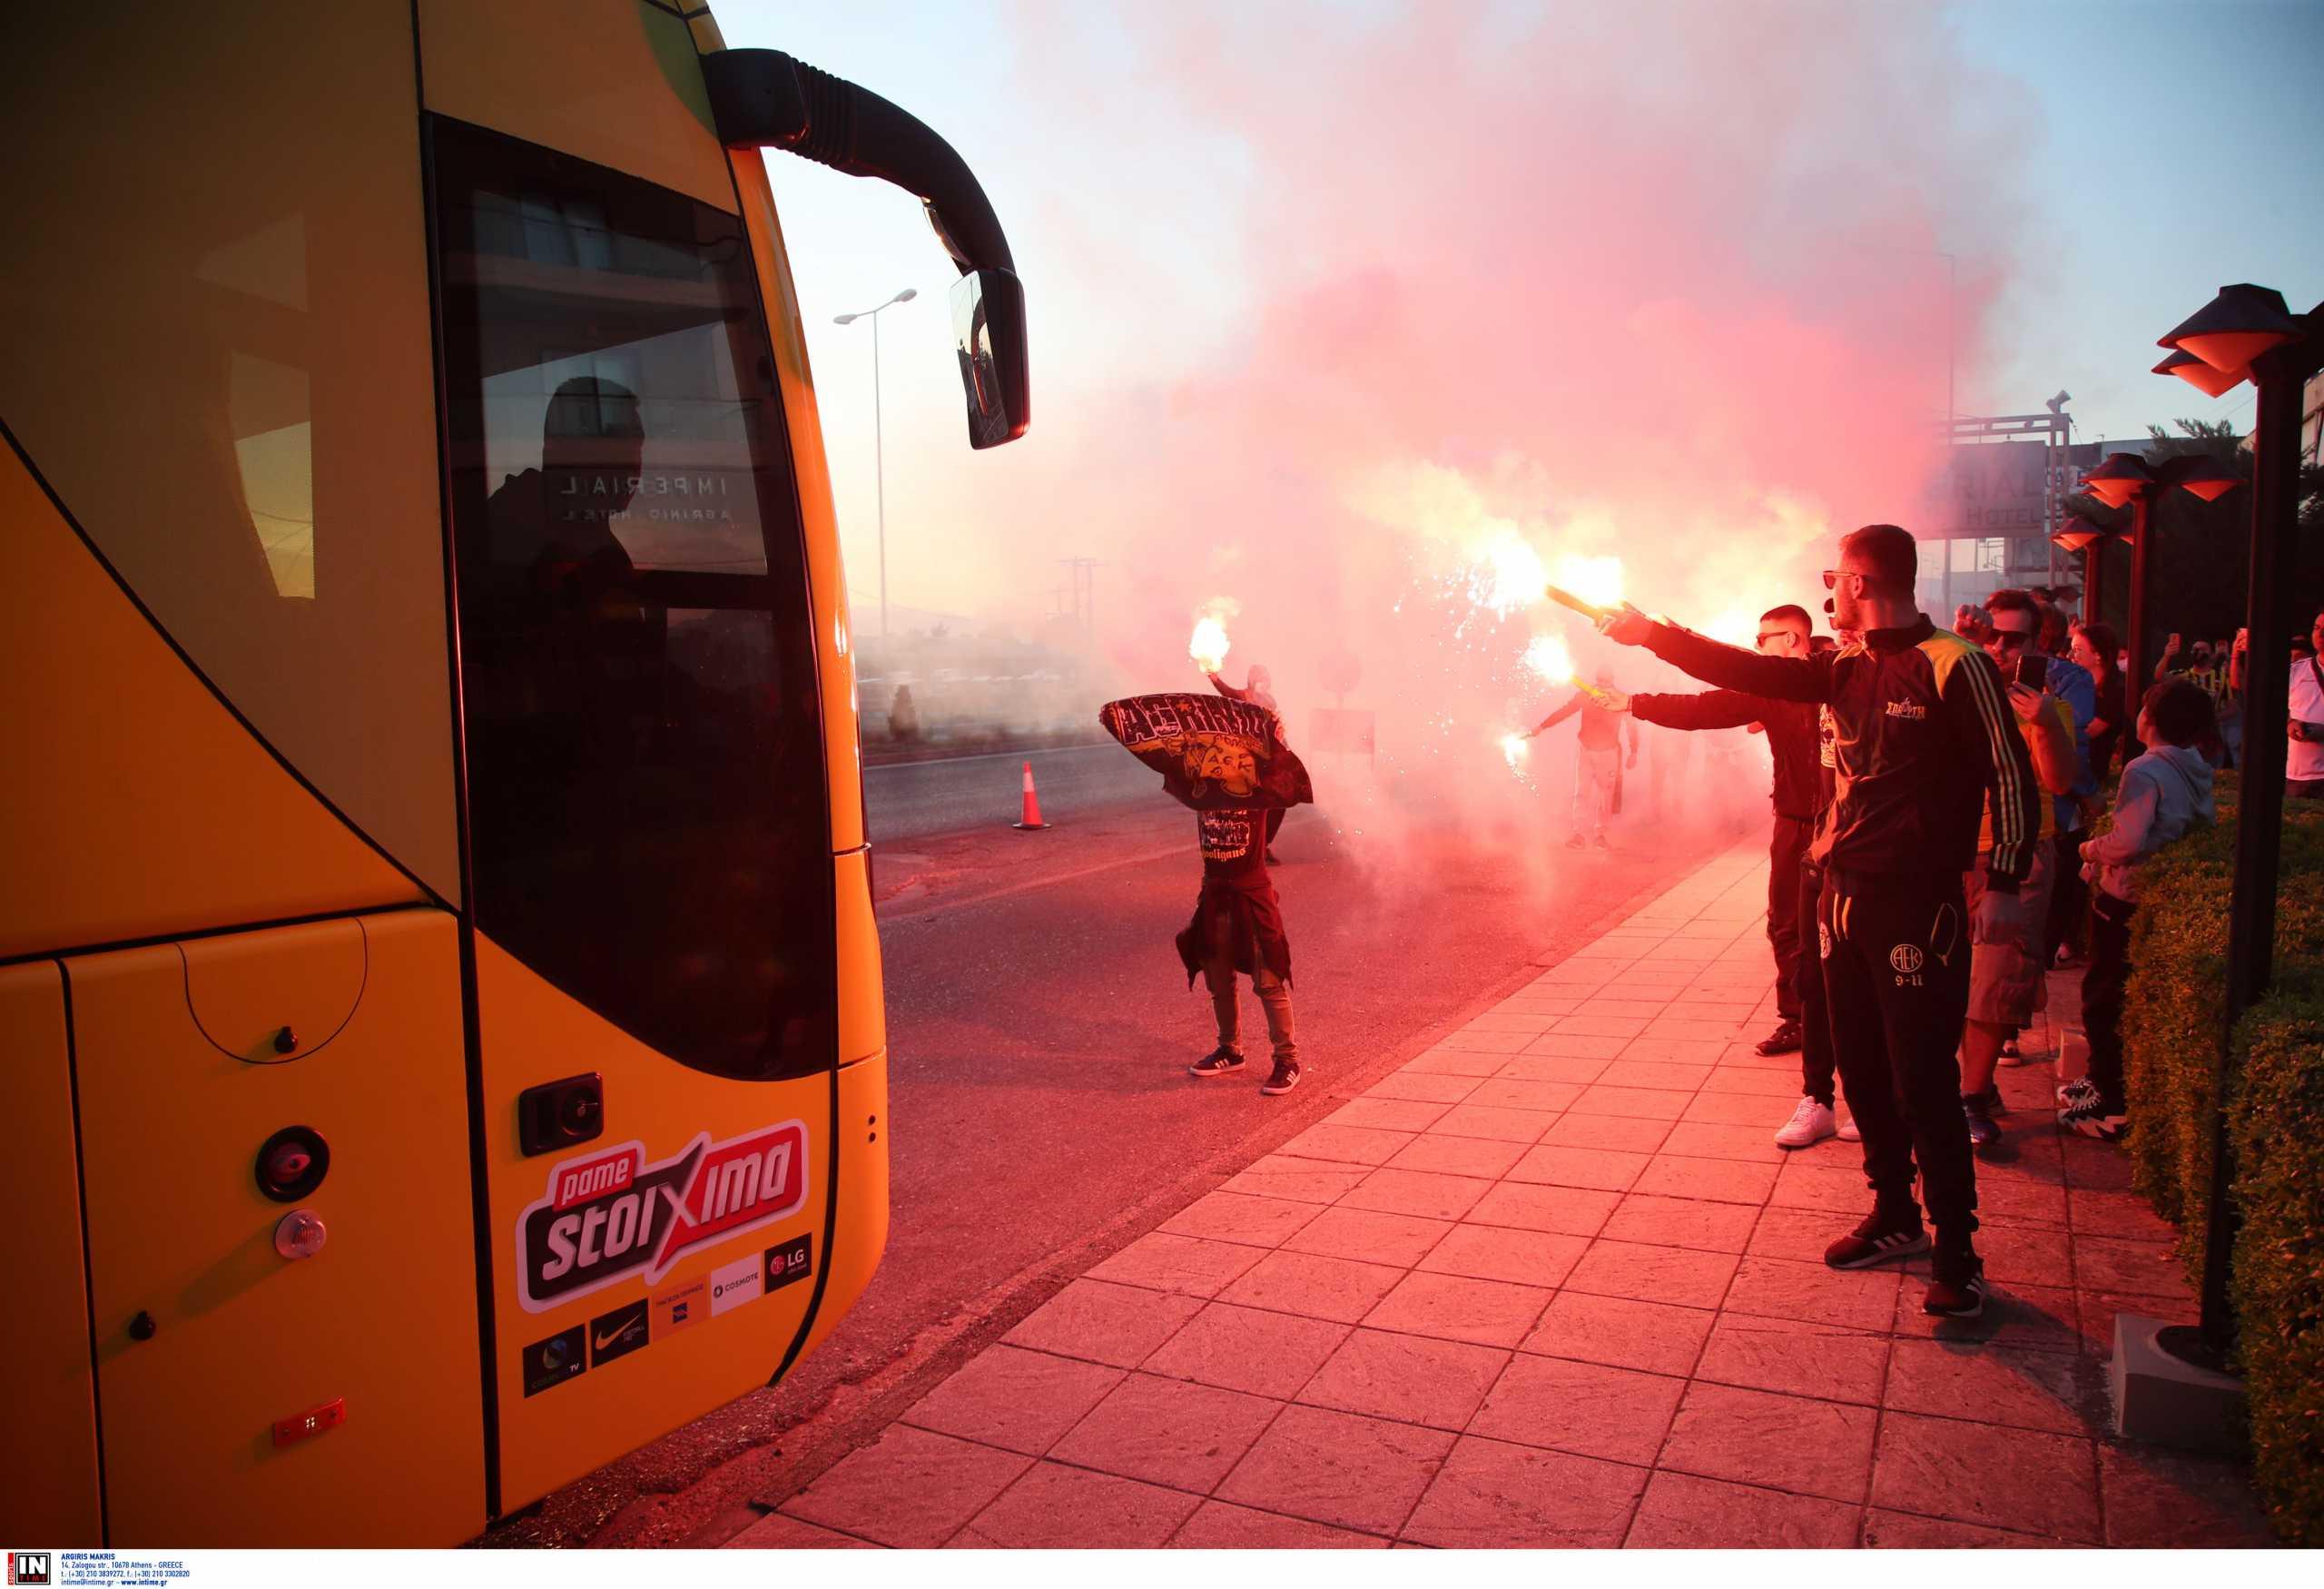 Superleague 1, Παναιτωλικός – ΑΕΚ: Αποθεωτική υποδοχή της Ένωσης στο Αγρίνιο